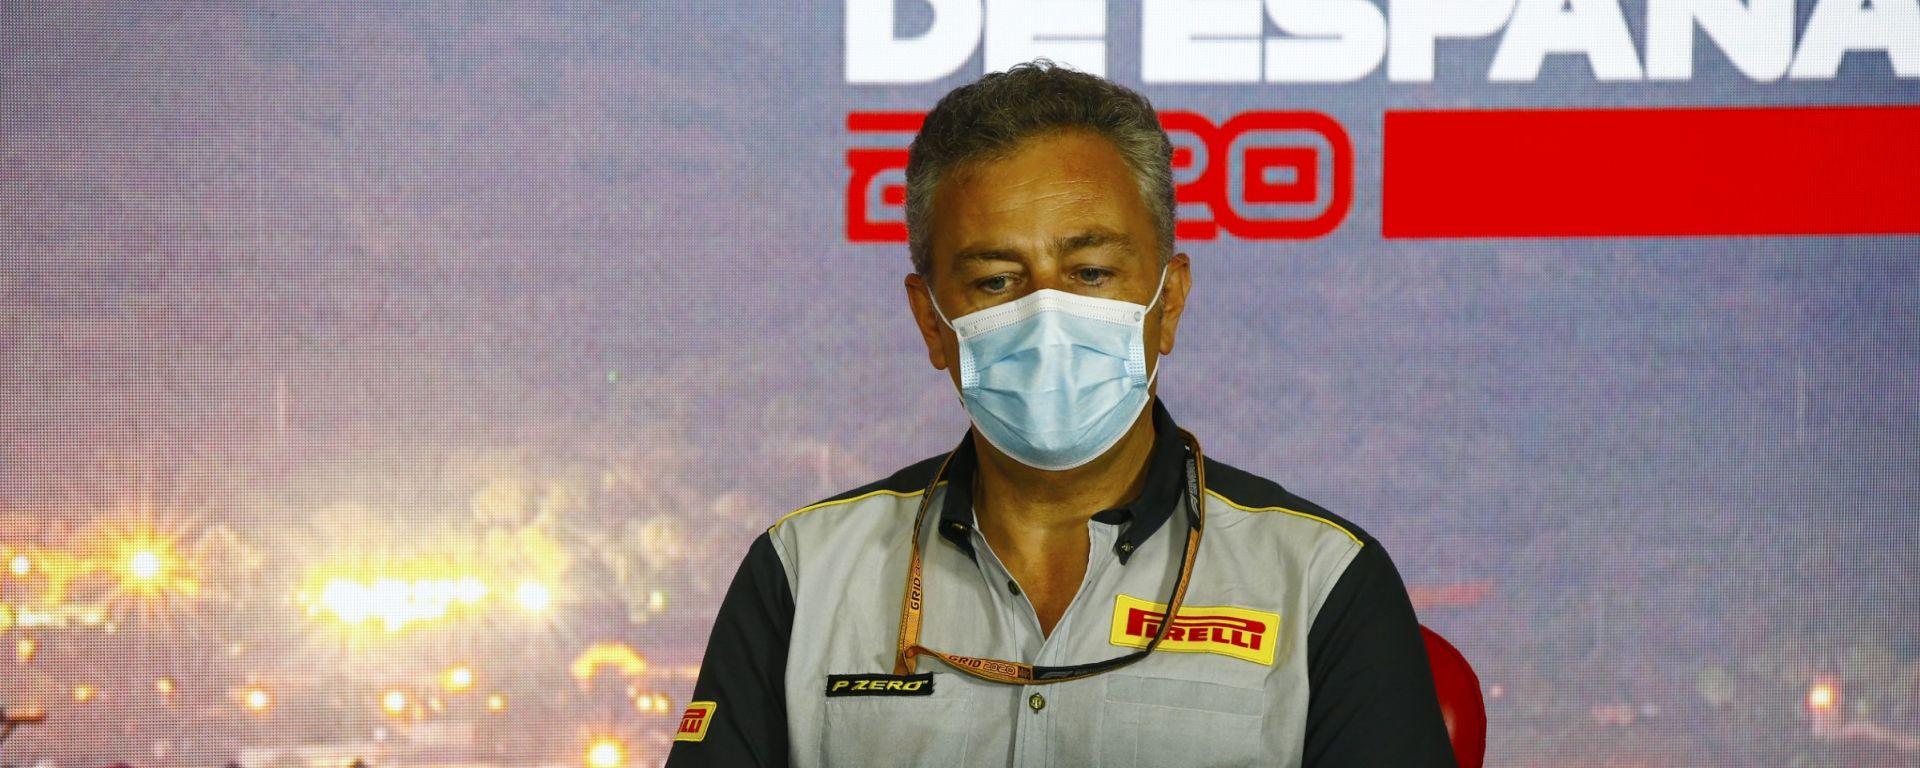 F1, GP Spagna 2020: Mario Isola (Pirelli)